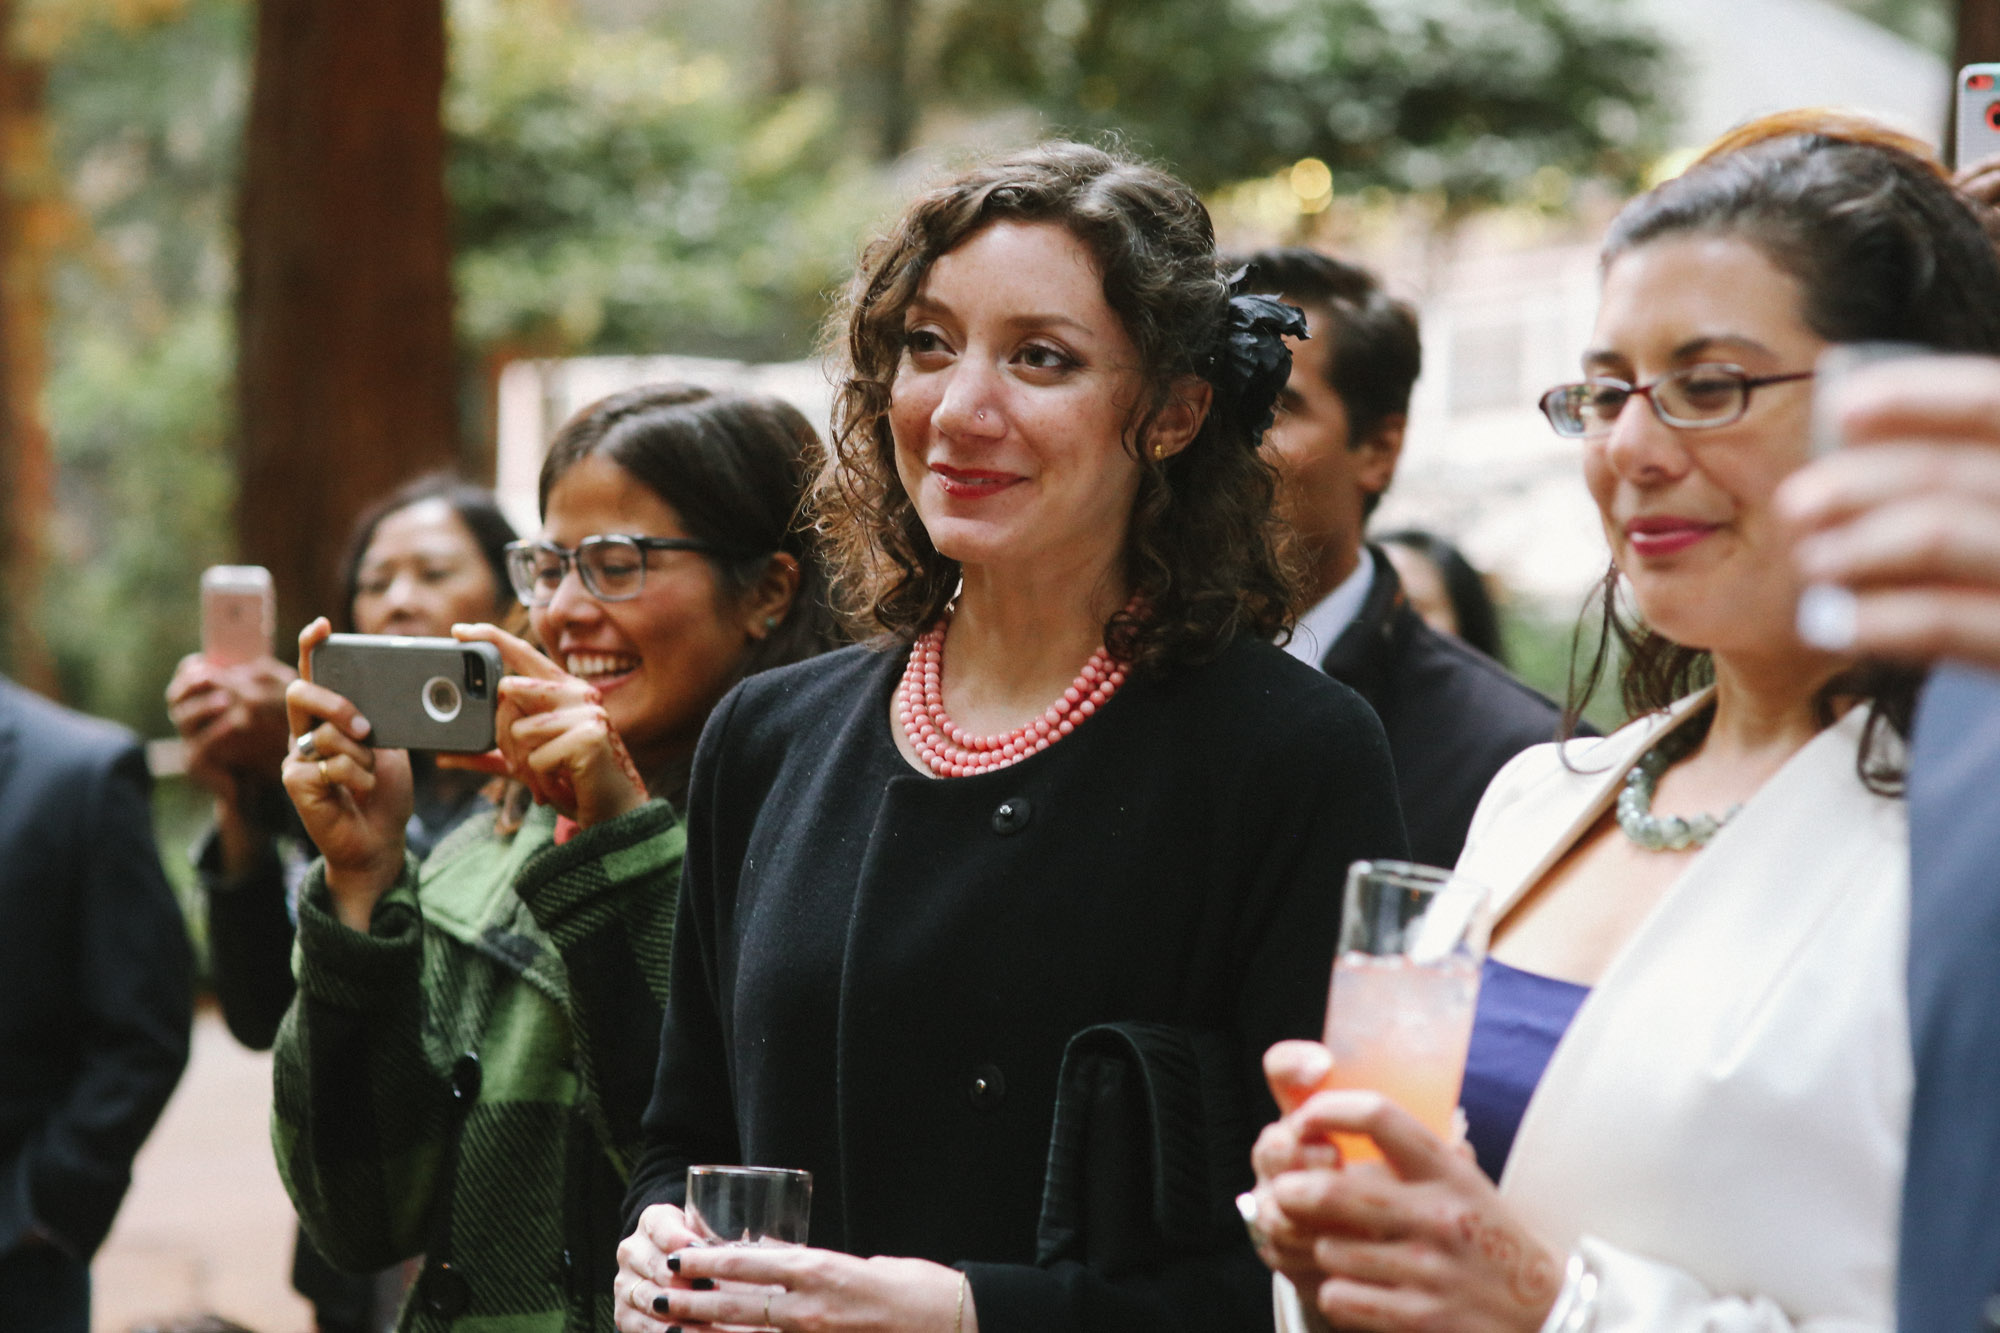 Wedding_Trocadero_house_Stern Grove_offbeat_San_Francisco-48.jpg